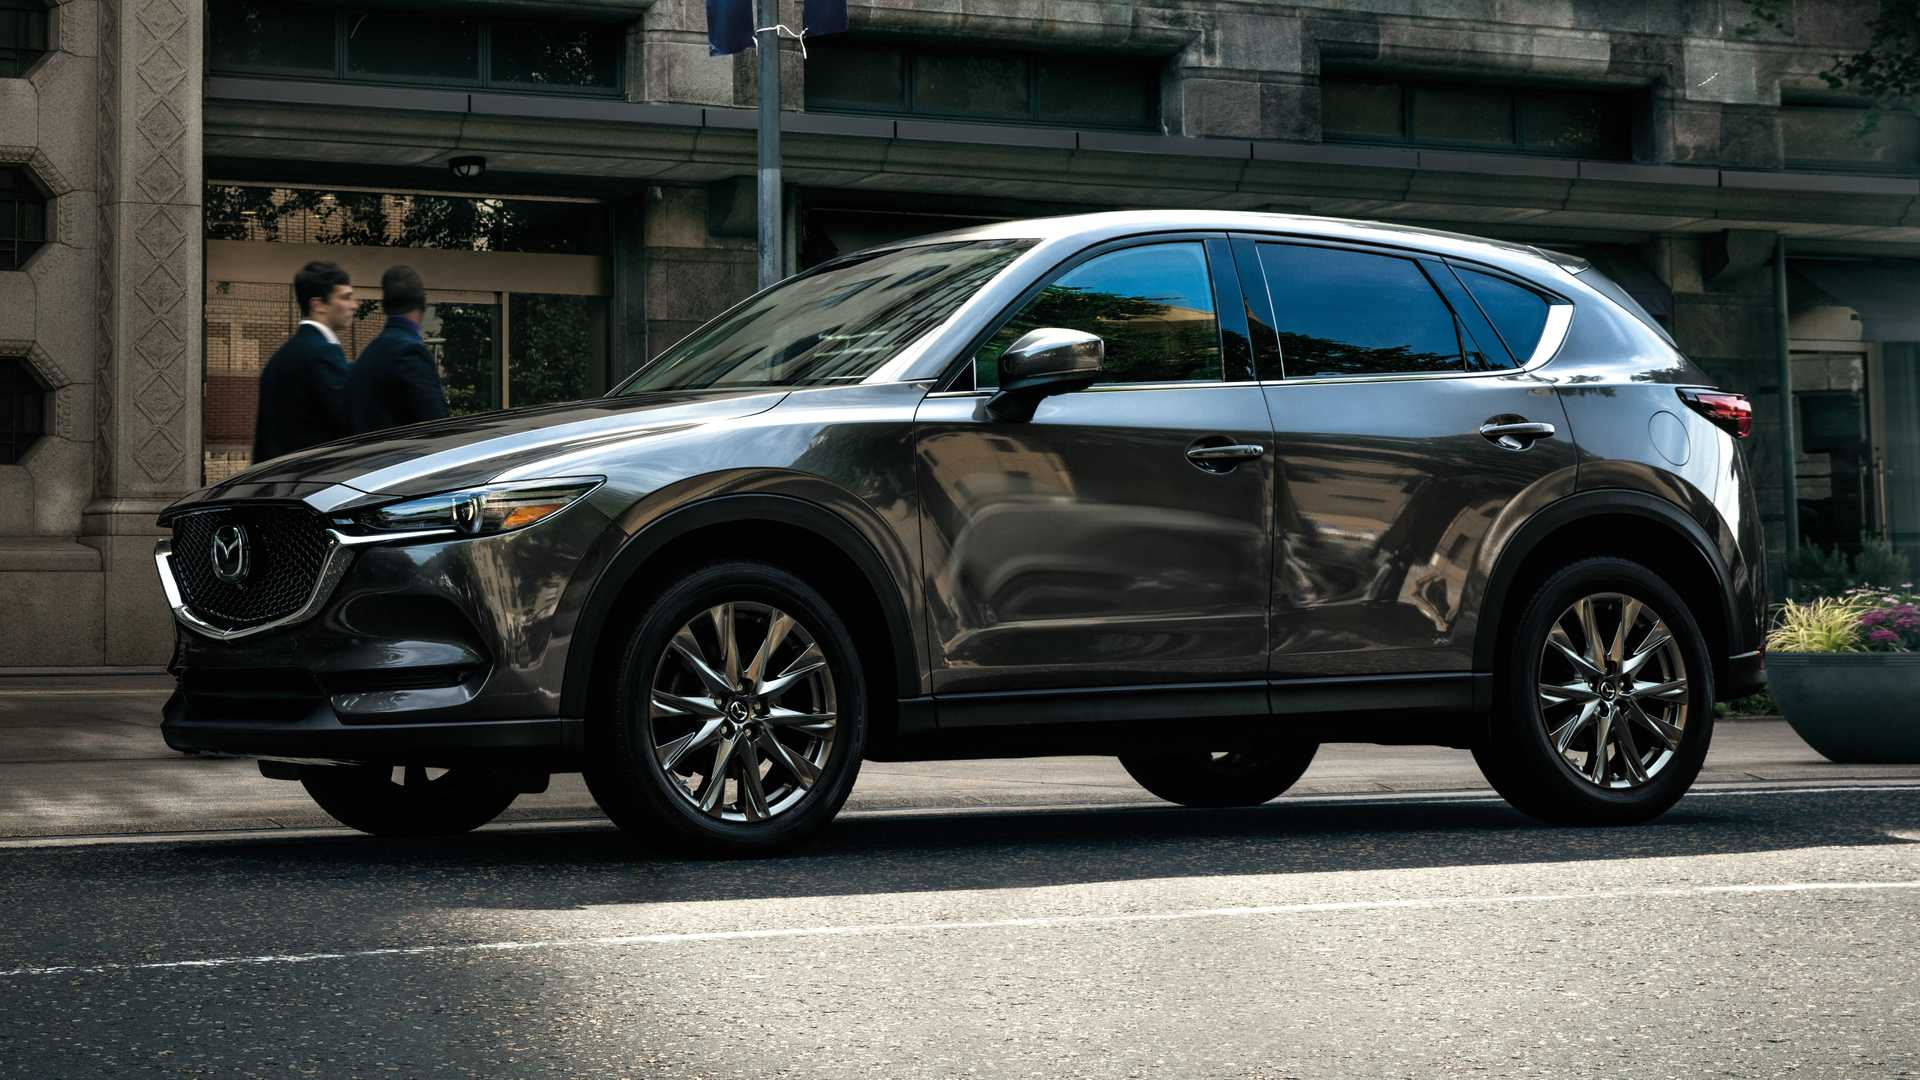 New Mazda CX-5 To Go Premium, Gain Six-Cylinder Engines: Report